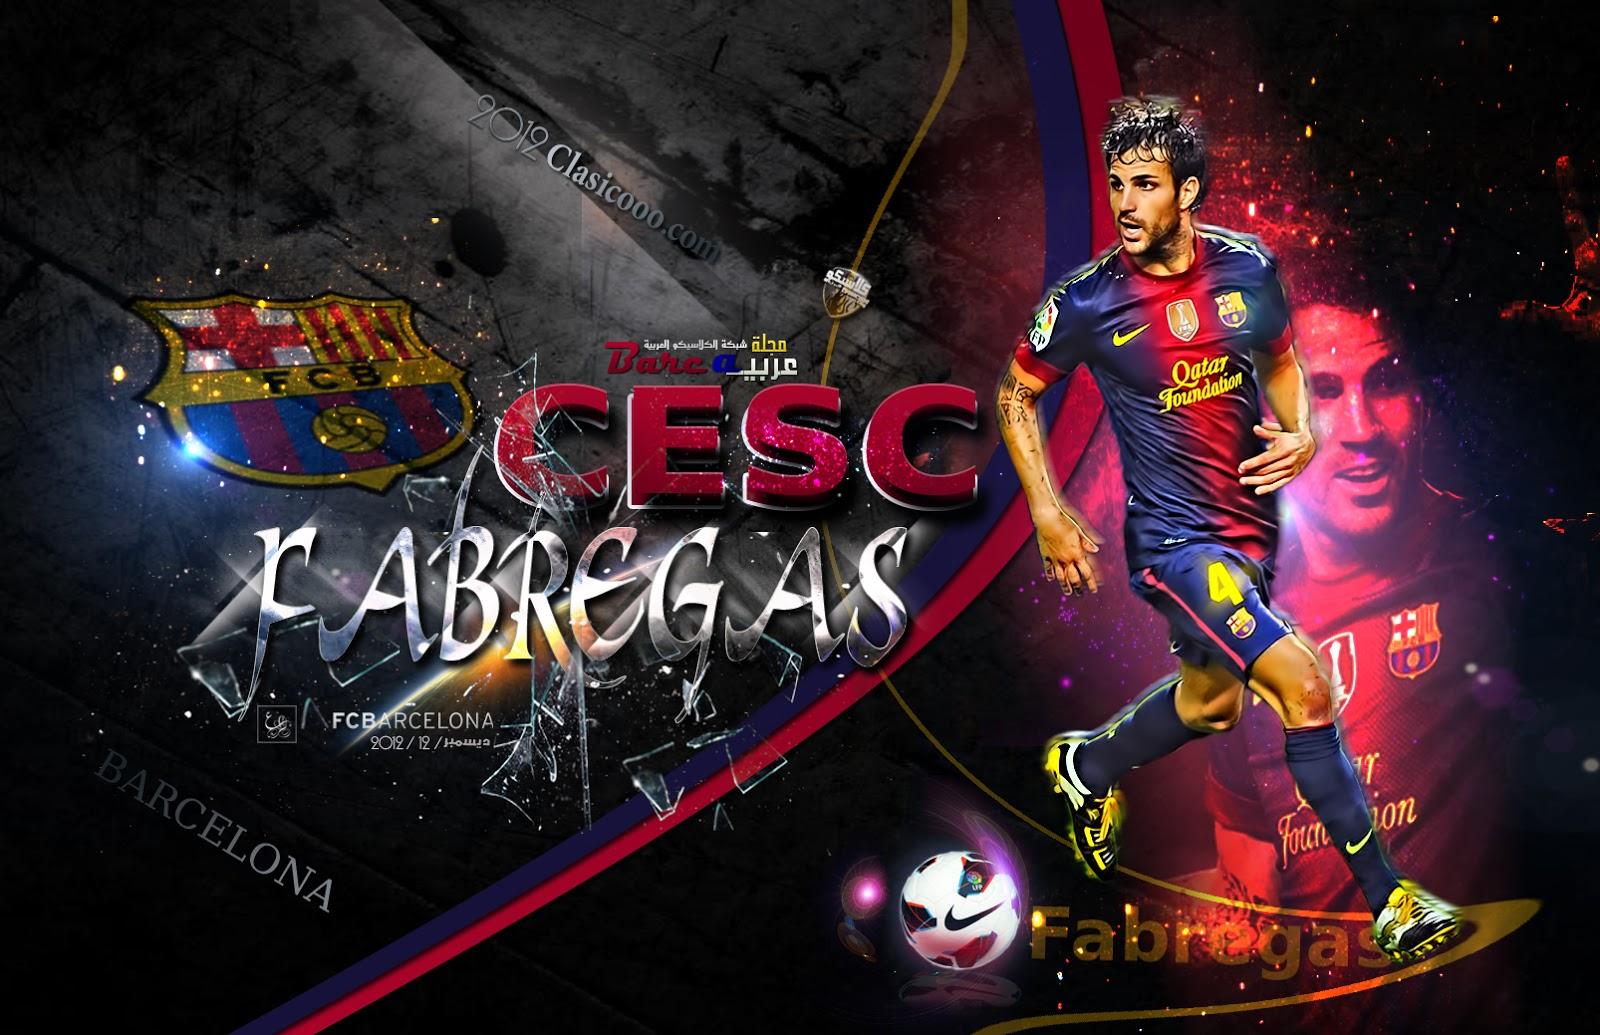 Cesc Fabregas HQ Wallpapers 2013-2014